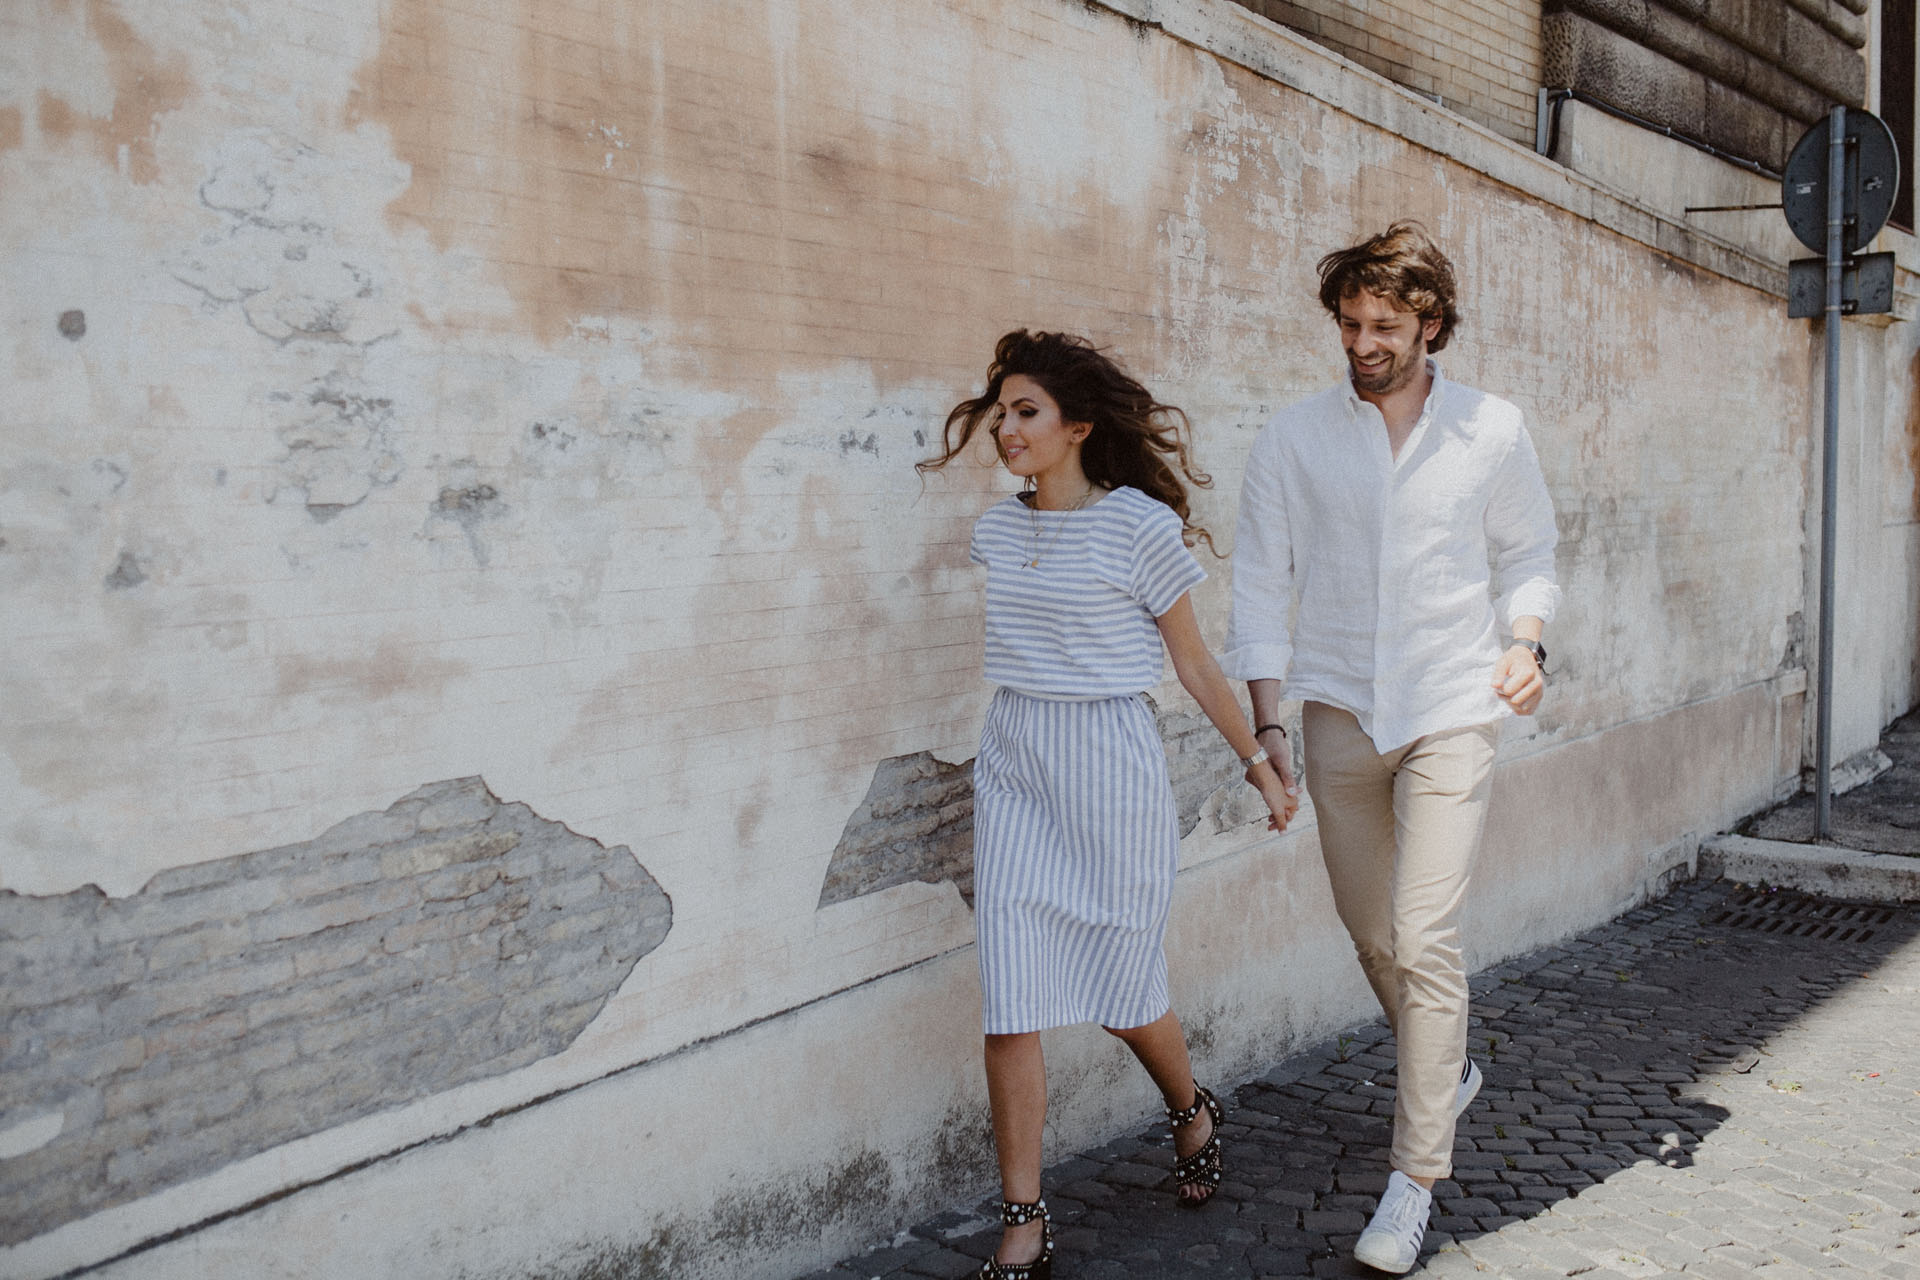 coupleshooting-roma-hochzeitsfotografen-wien-agnesundandi-18